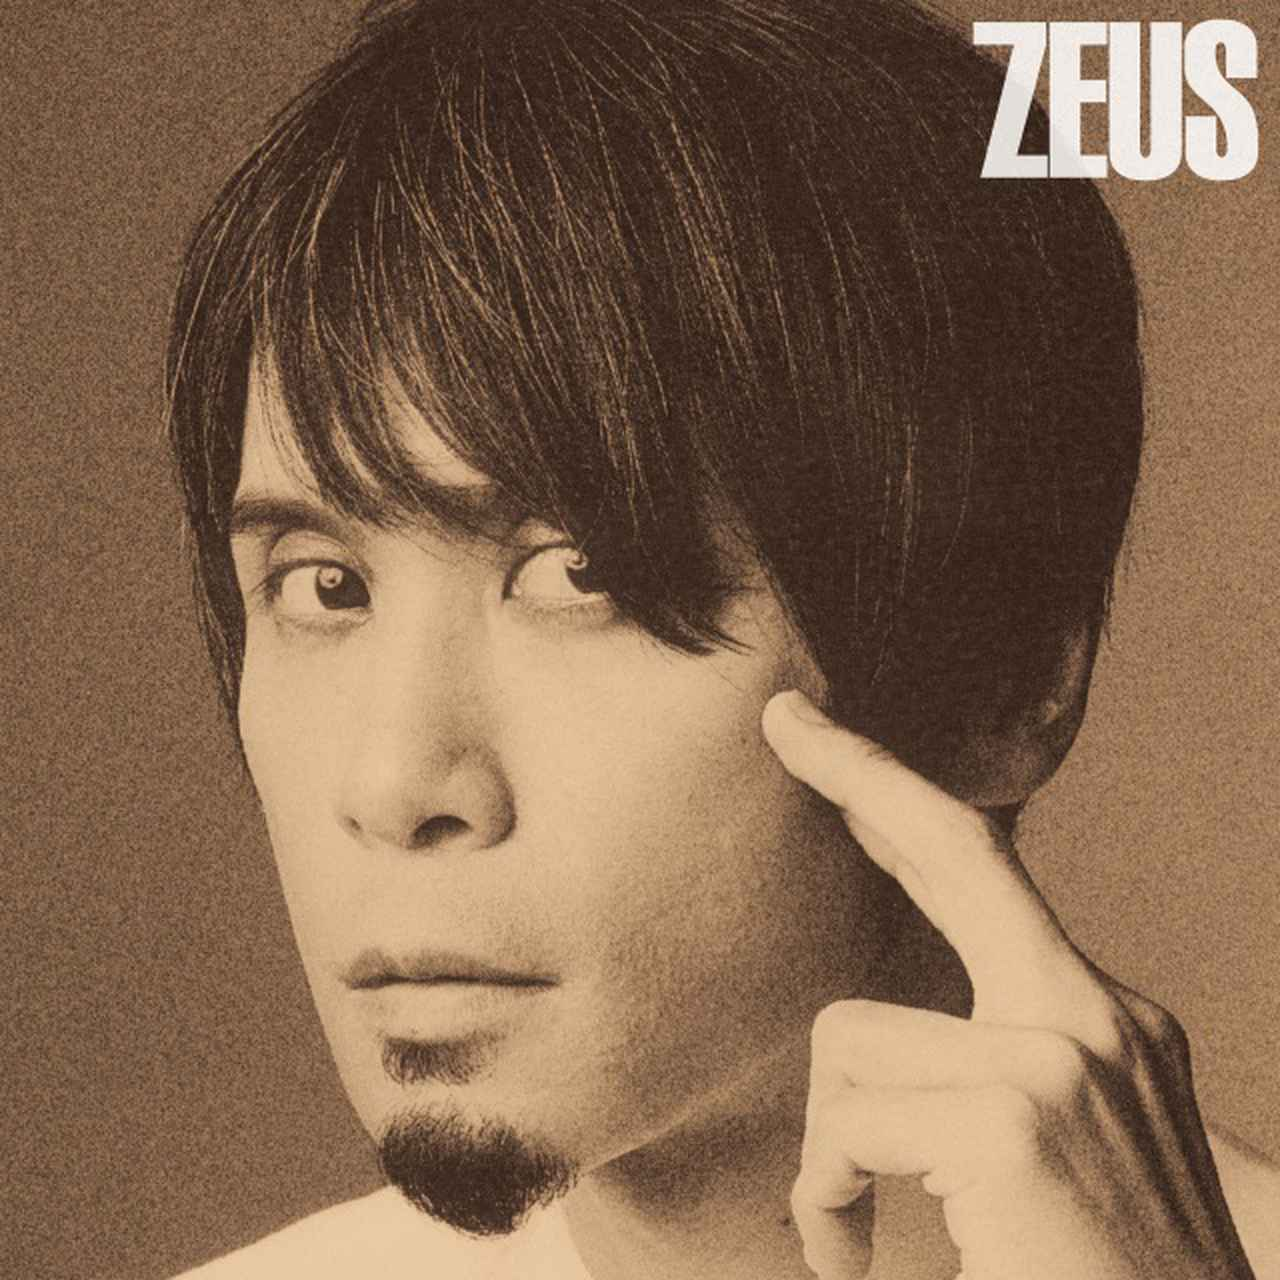 画像: ZEUS / ZEUS on OTOTOY Music Store